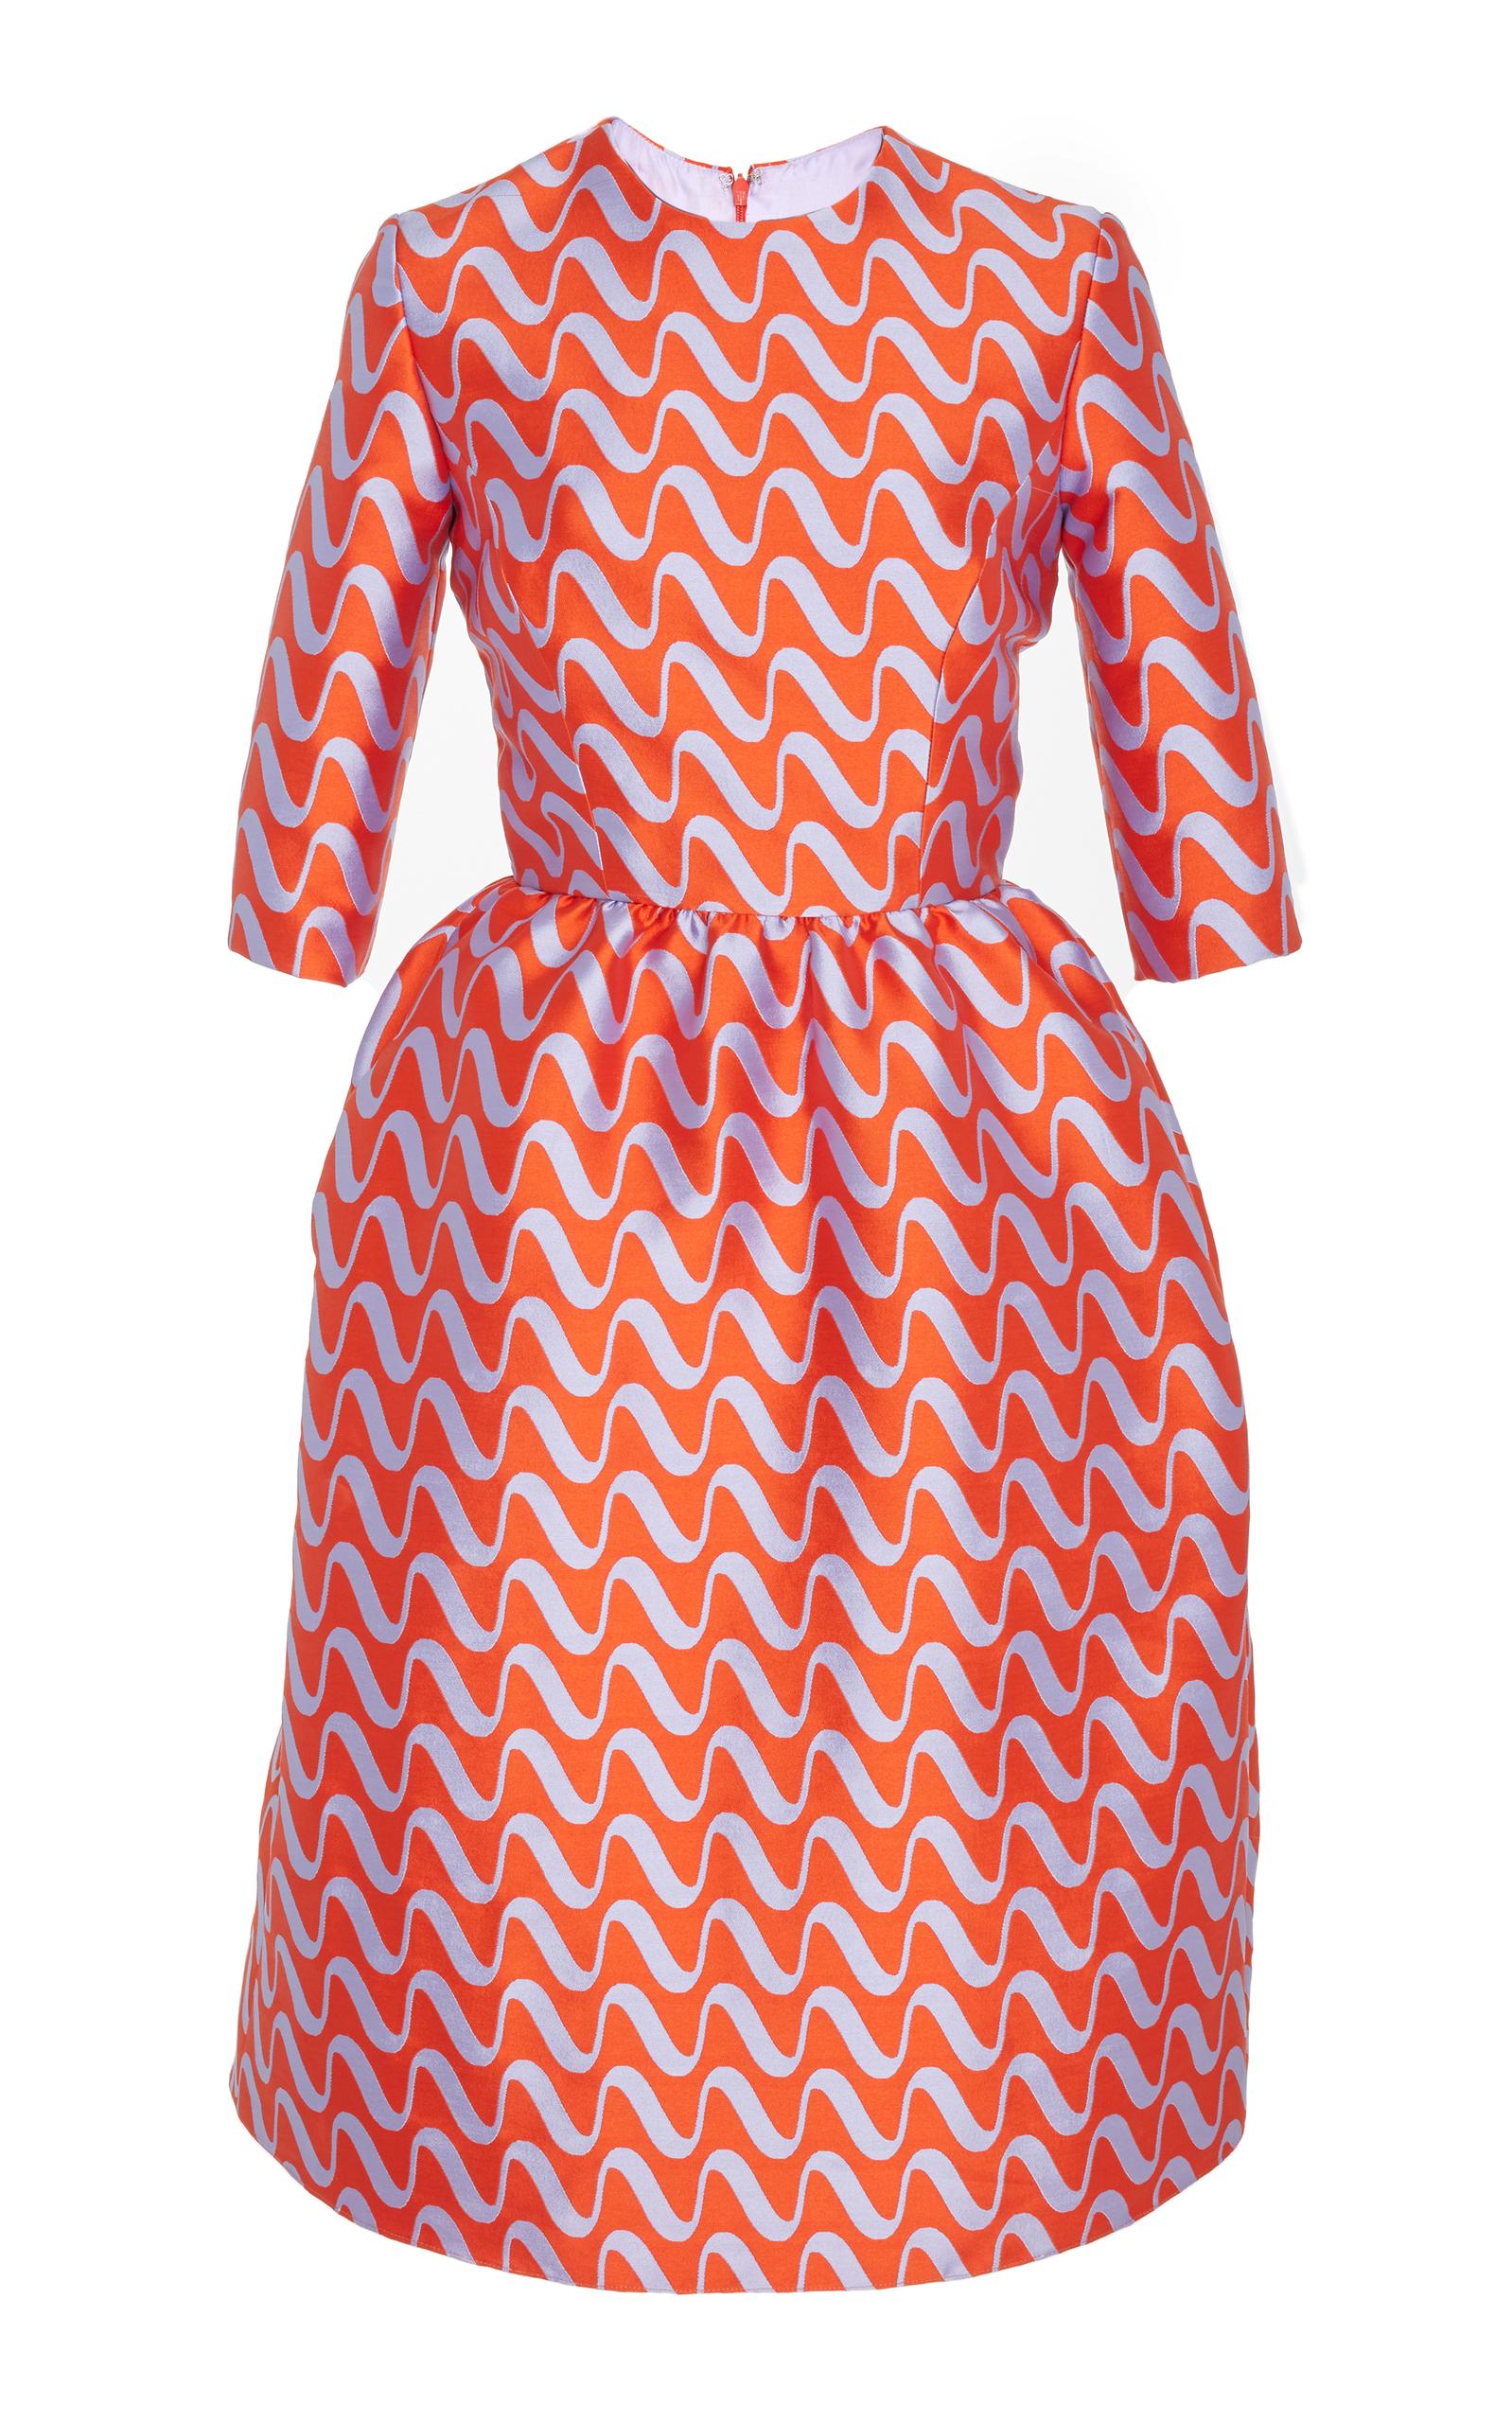 REEM ACRA Wave Print Cocktail Dress, Orange   ModeSens